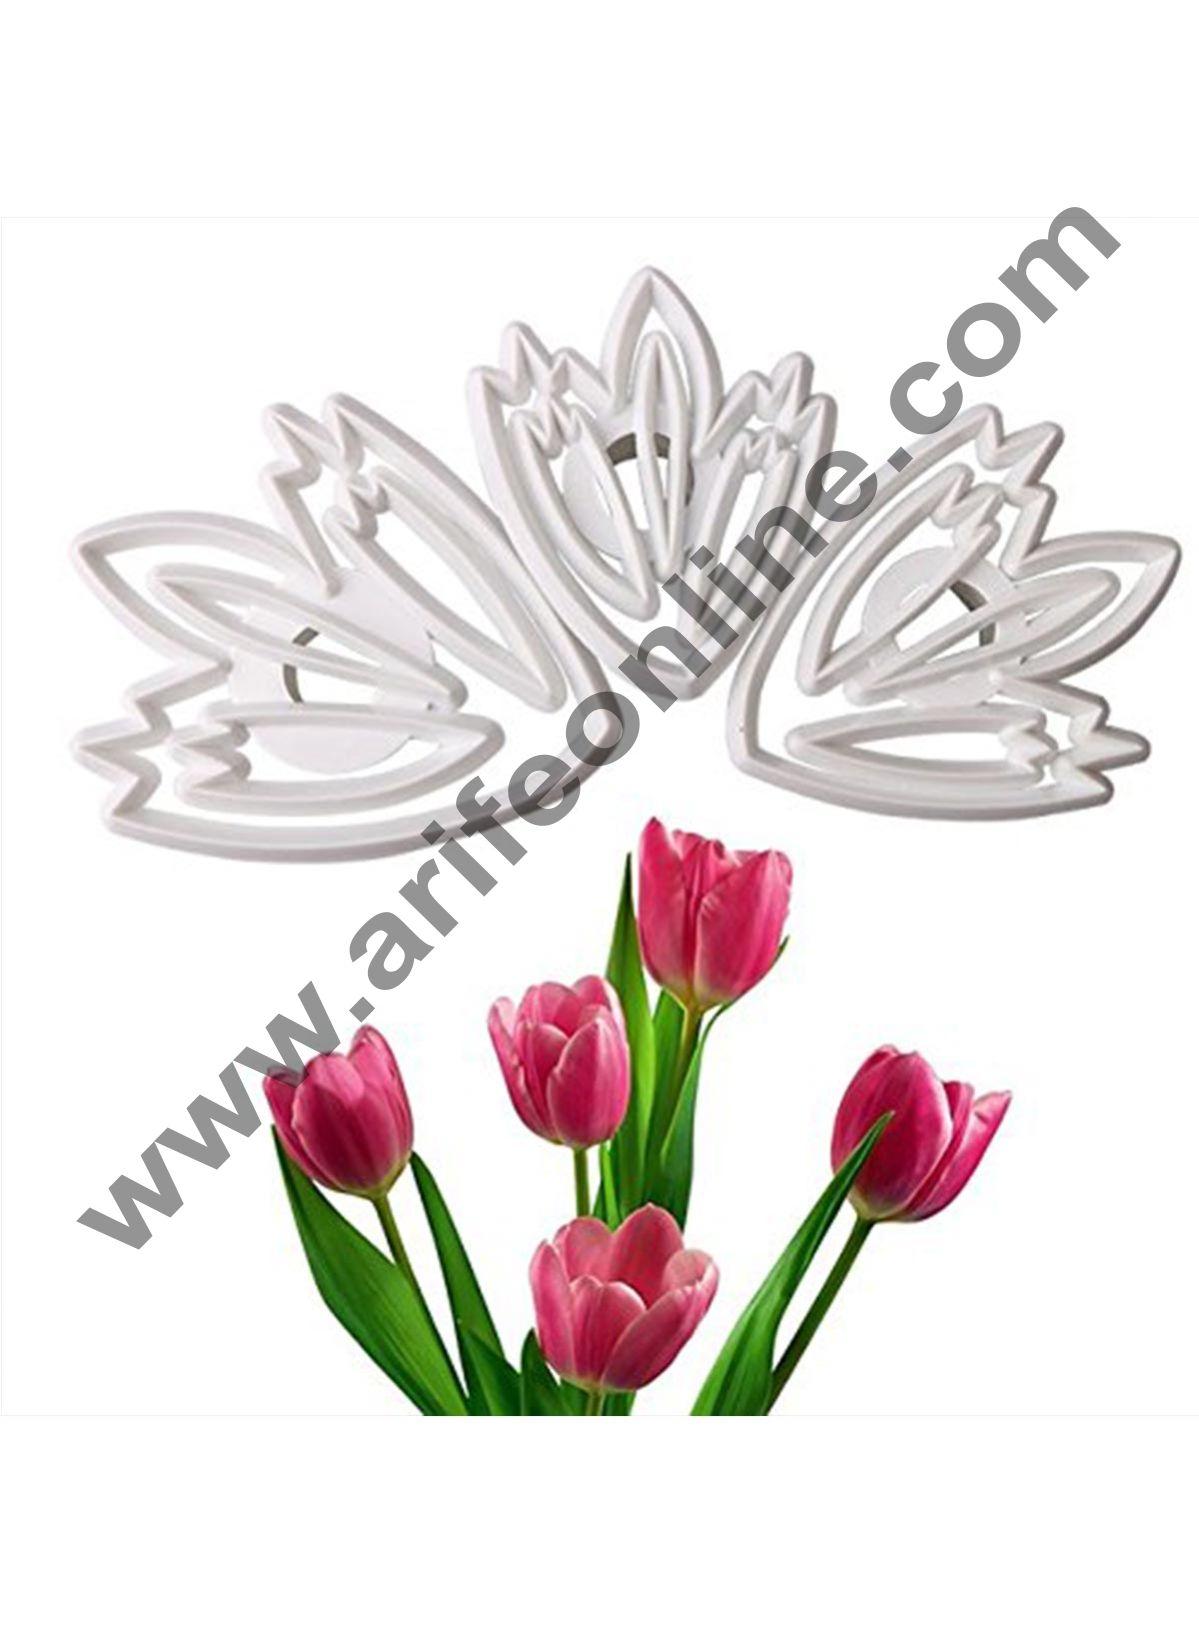 Cake Decor 3pcs/set Tulip Flower Design Plastic Fondant Mold 3D Sugarcraft Cake Cutter Cookie Mold Baking Tools